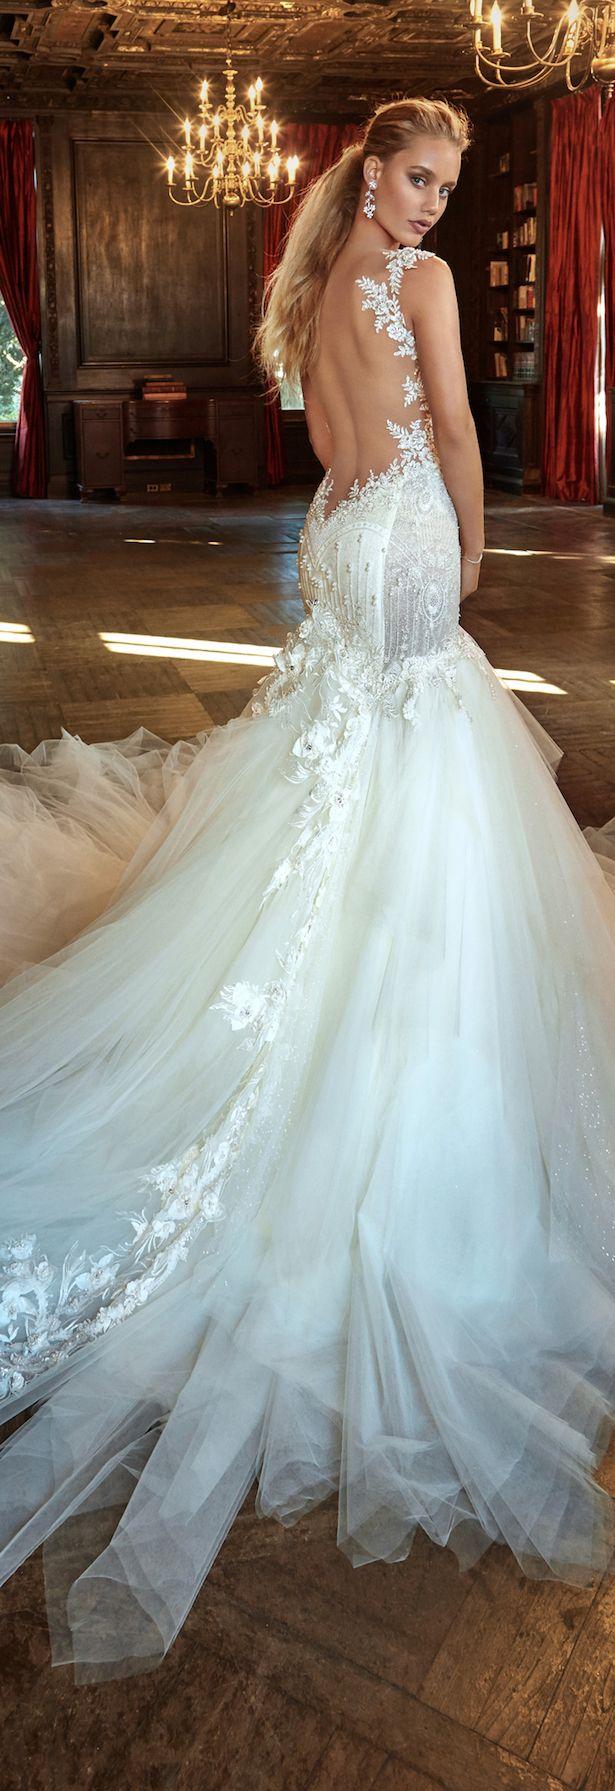 1034 best Wedding Dresses images on Pinterest | Bridal dresses ...